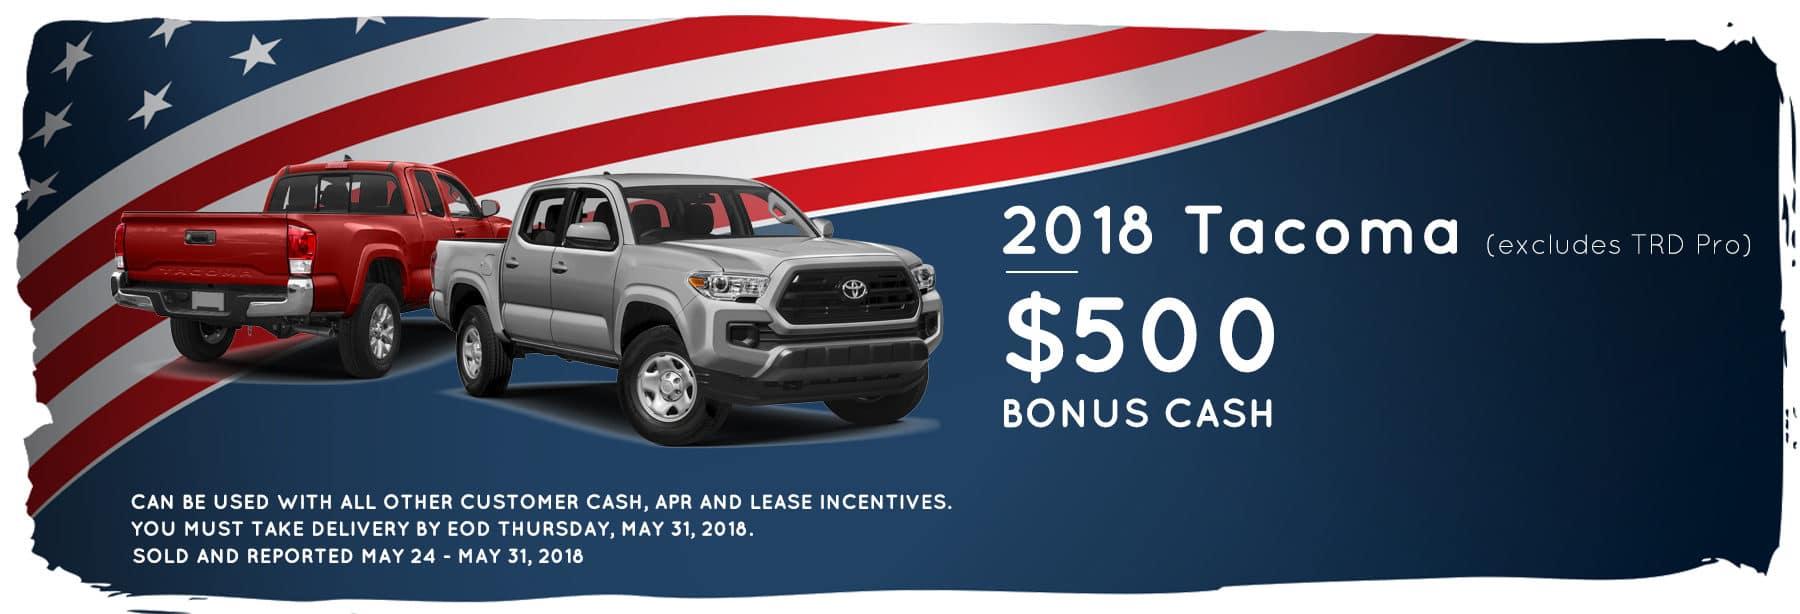 Lancaster Toyota: Toyota Dealer in East Petersburg, serving Lancaster and York